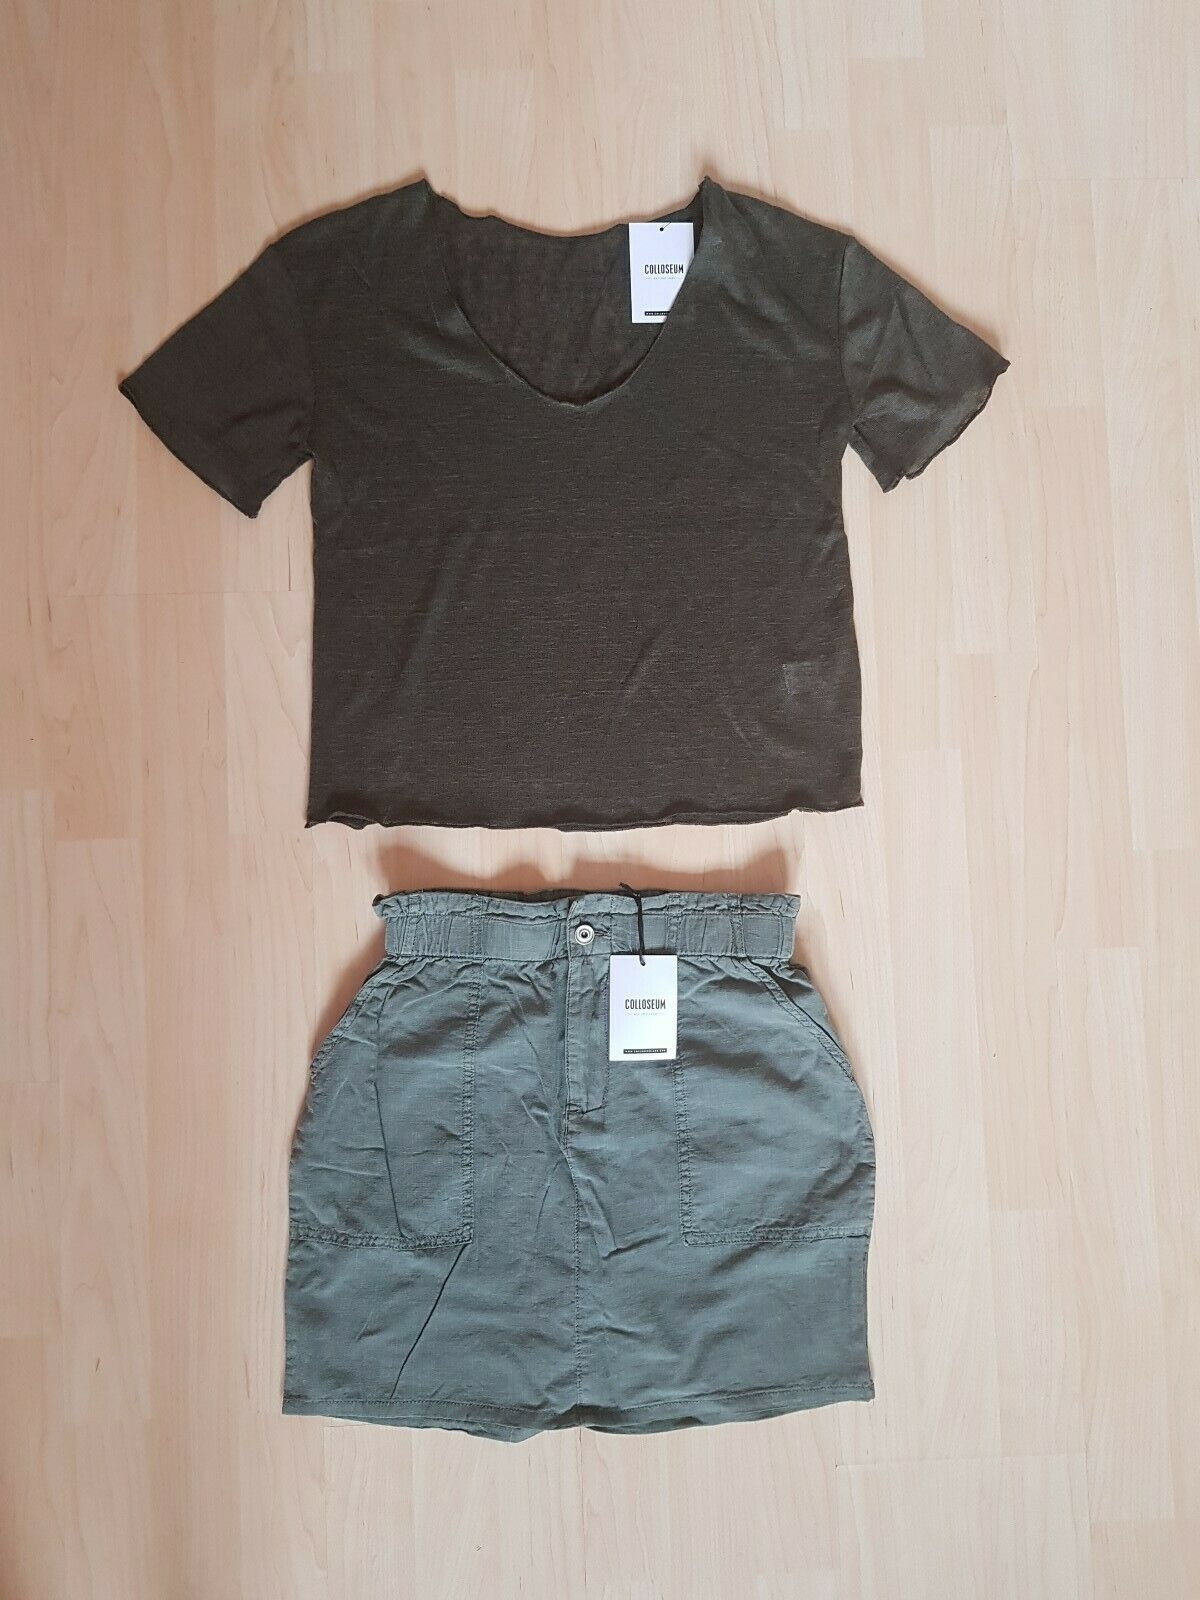 Colloseum 2 tlg. Damen Dschungel Safari Set Shirt Mini Rock Gr. 34 XS grün khaki